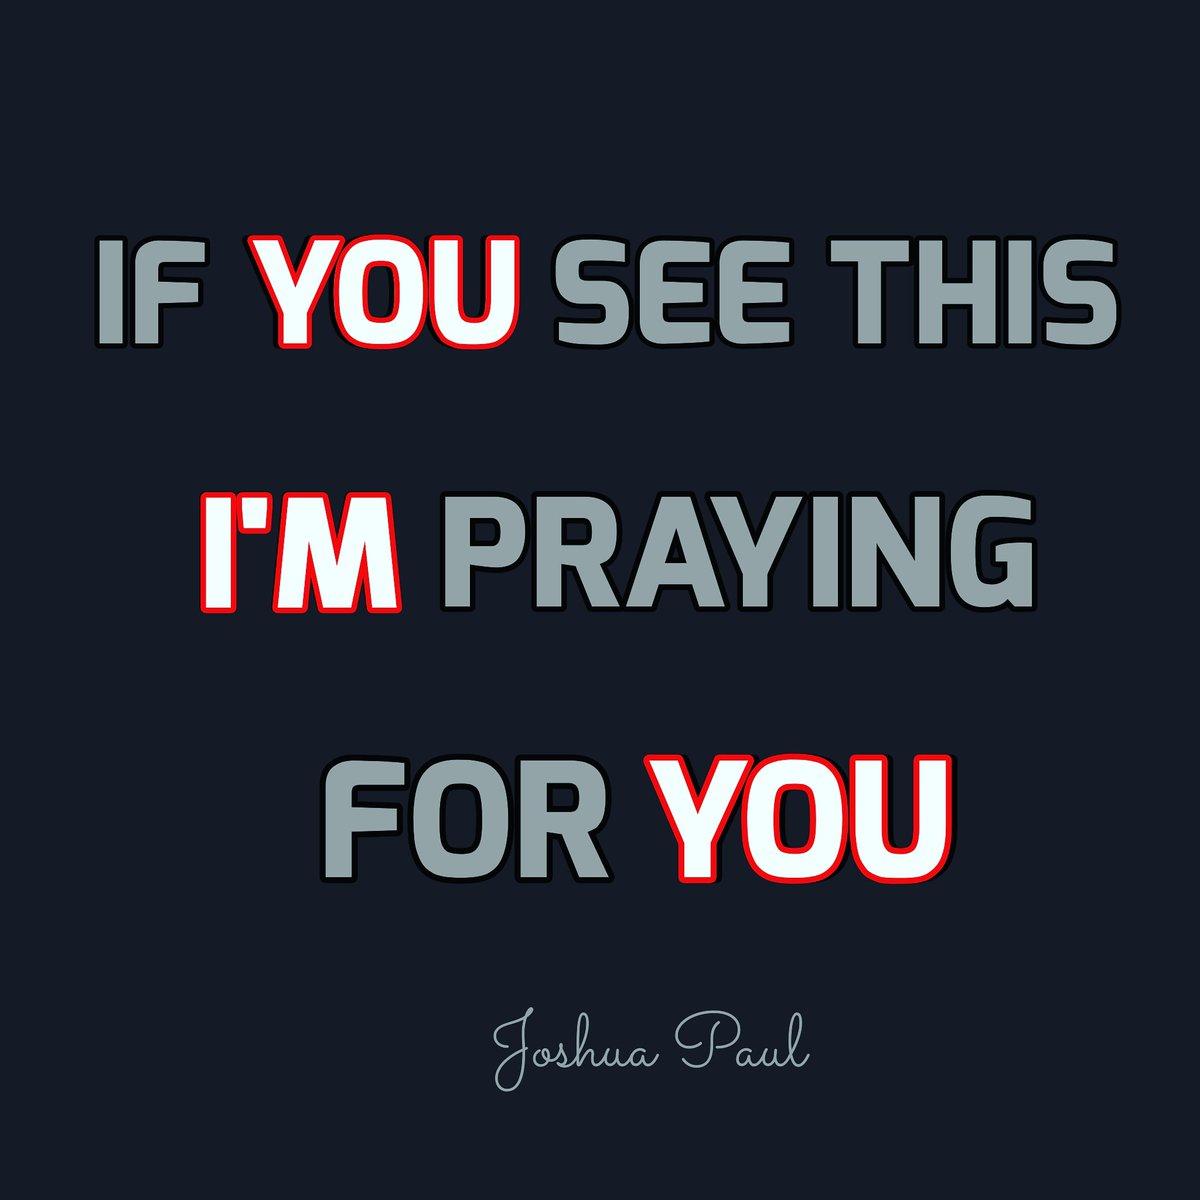 "IF YOU SEE THIS I'M PRAYING FOR YOU""  Comment below for Prayer requests.   #prayers #pray #god #faith #peace #believe #hope #prayer #amen #grace #love #praying #spirituality #spiritual #soul #wisdom #life #trust #religion #meditation #faithful #calm #forgiveness #mind #jesus"